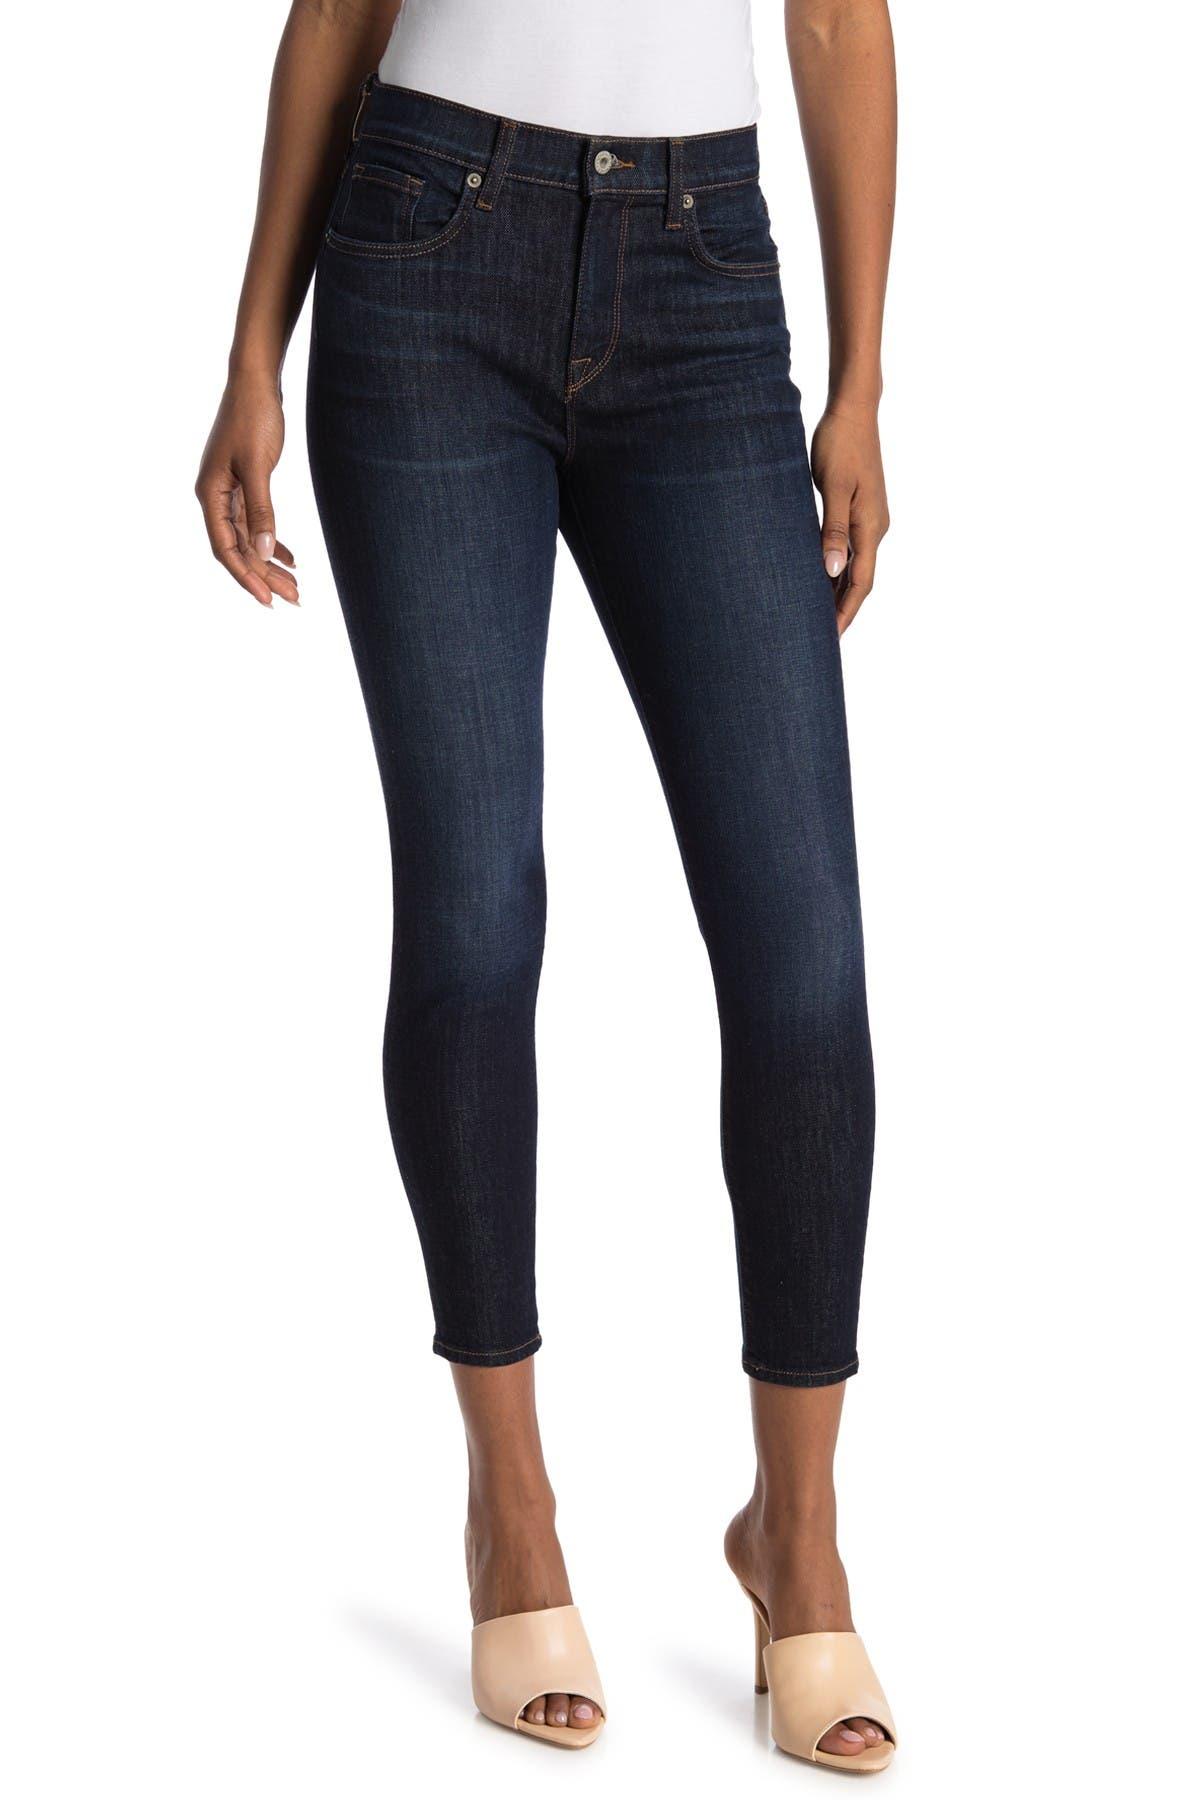 Image of BALDWIN Karlie High Waist Skinny Jeans